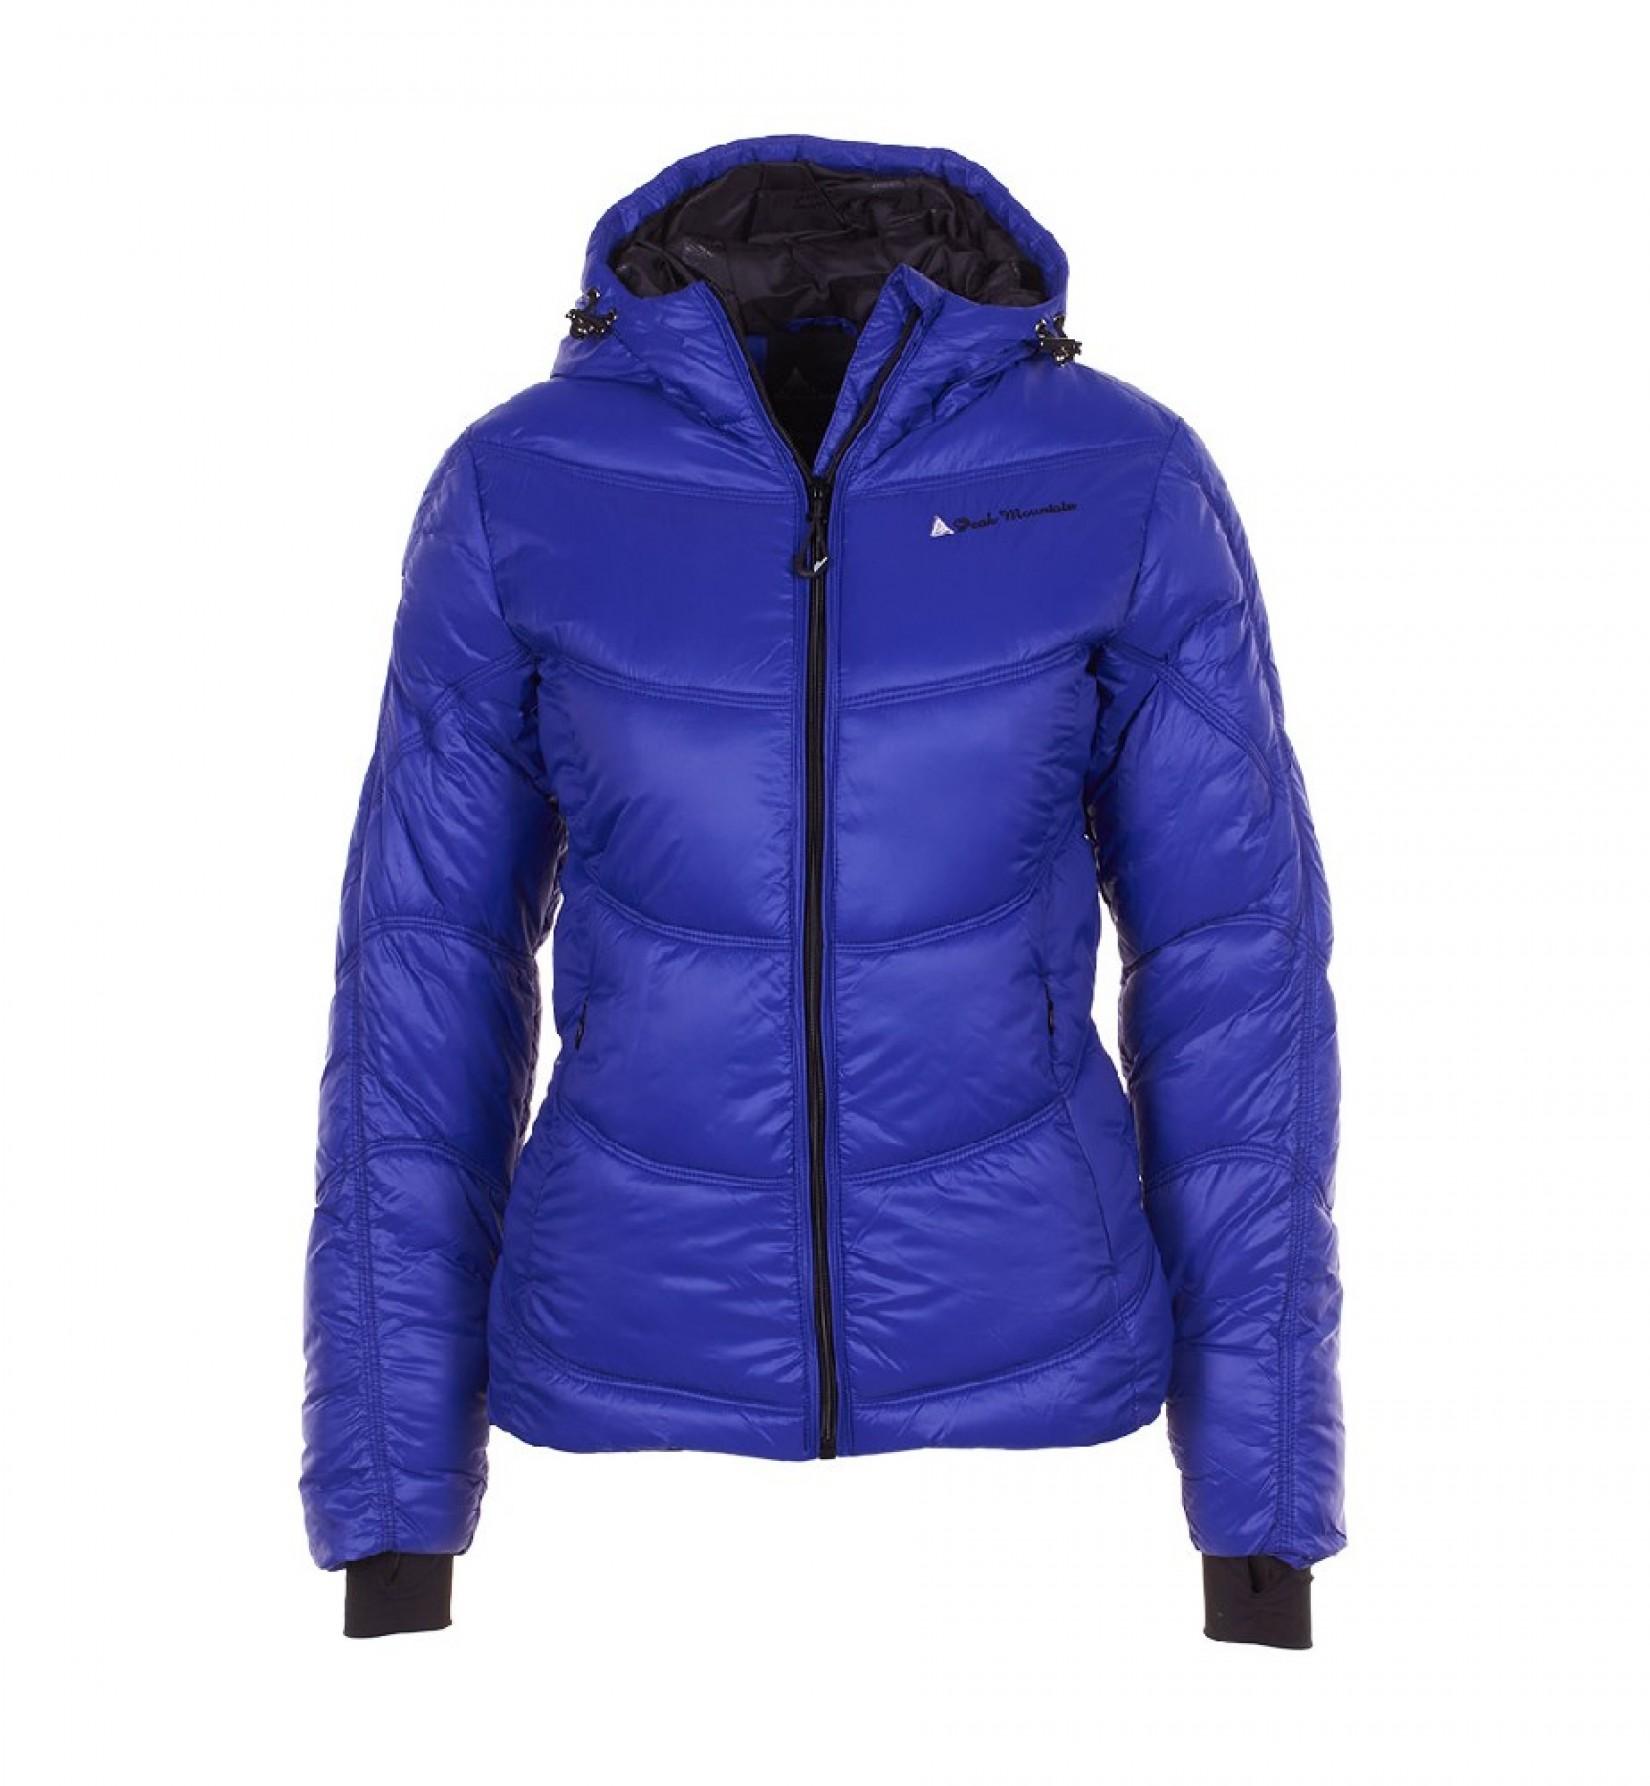 doudoune de ski femme ansei couleur bleu peak mountain. Black Bedroom Furniture Sets. Home Design Ideas